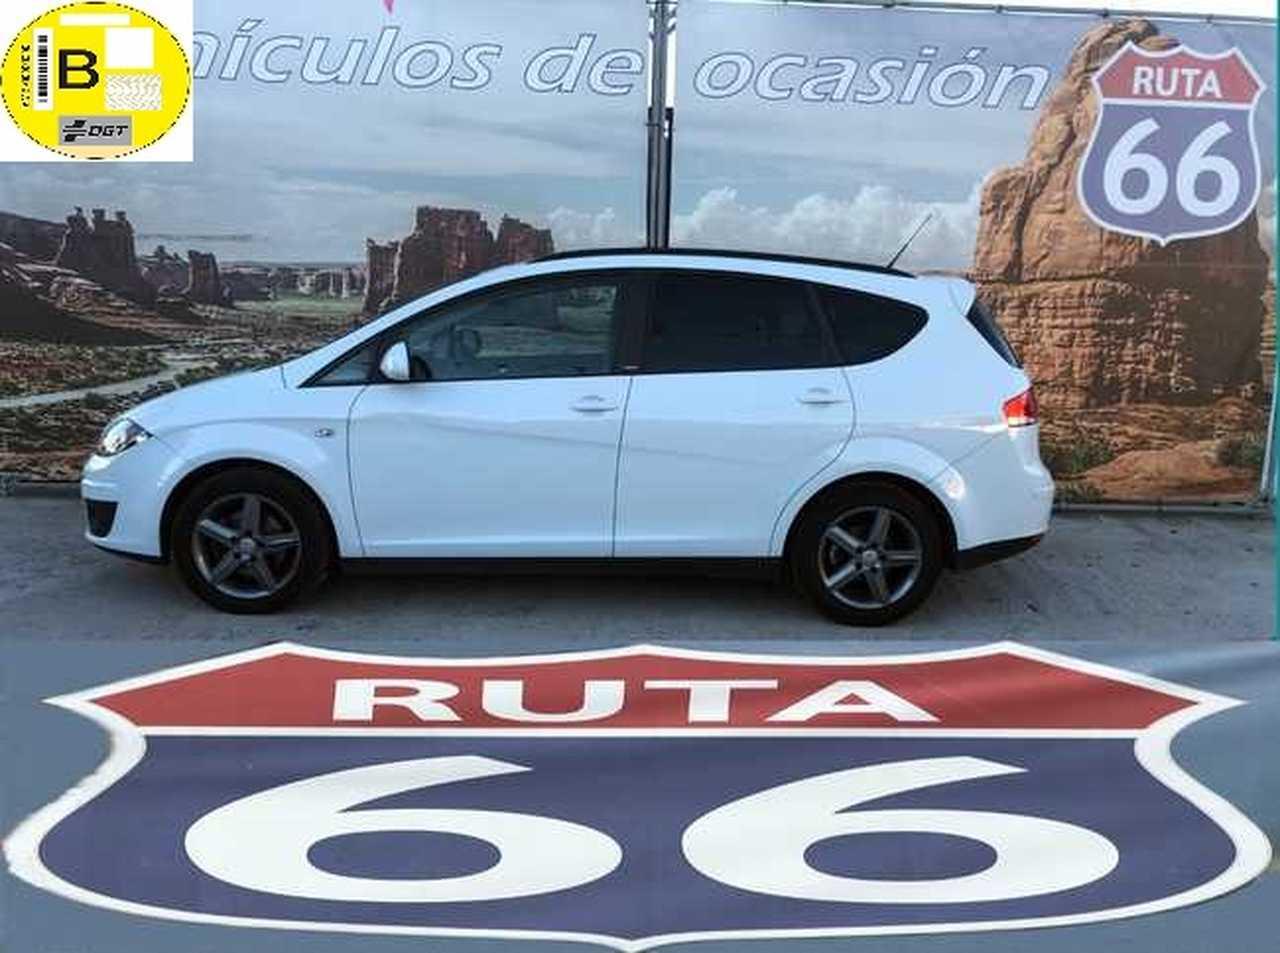 Seat Altea XL 2.0 TDI 140cv ITech 5p.   - Foto 1